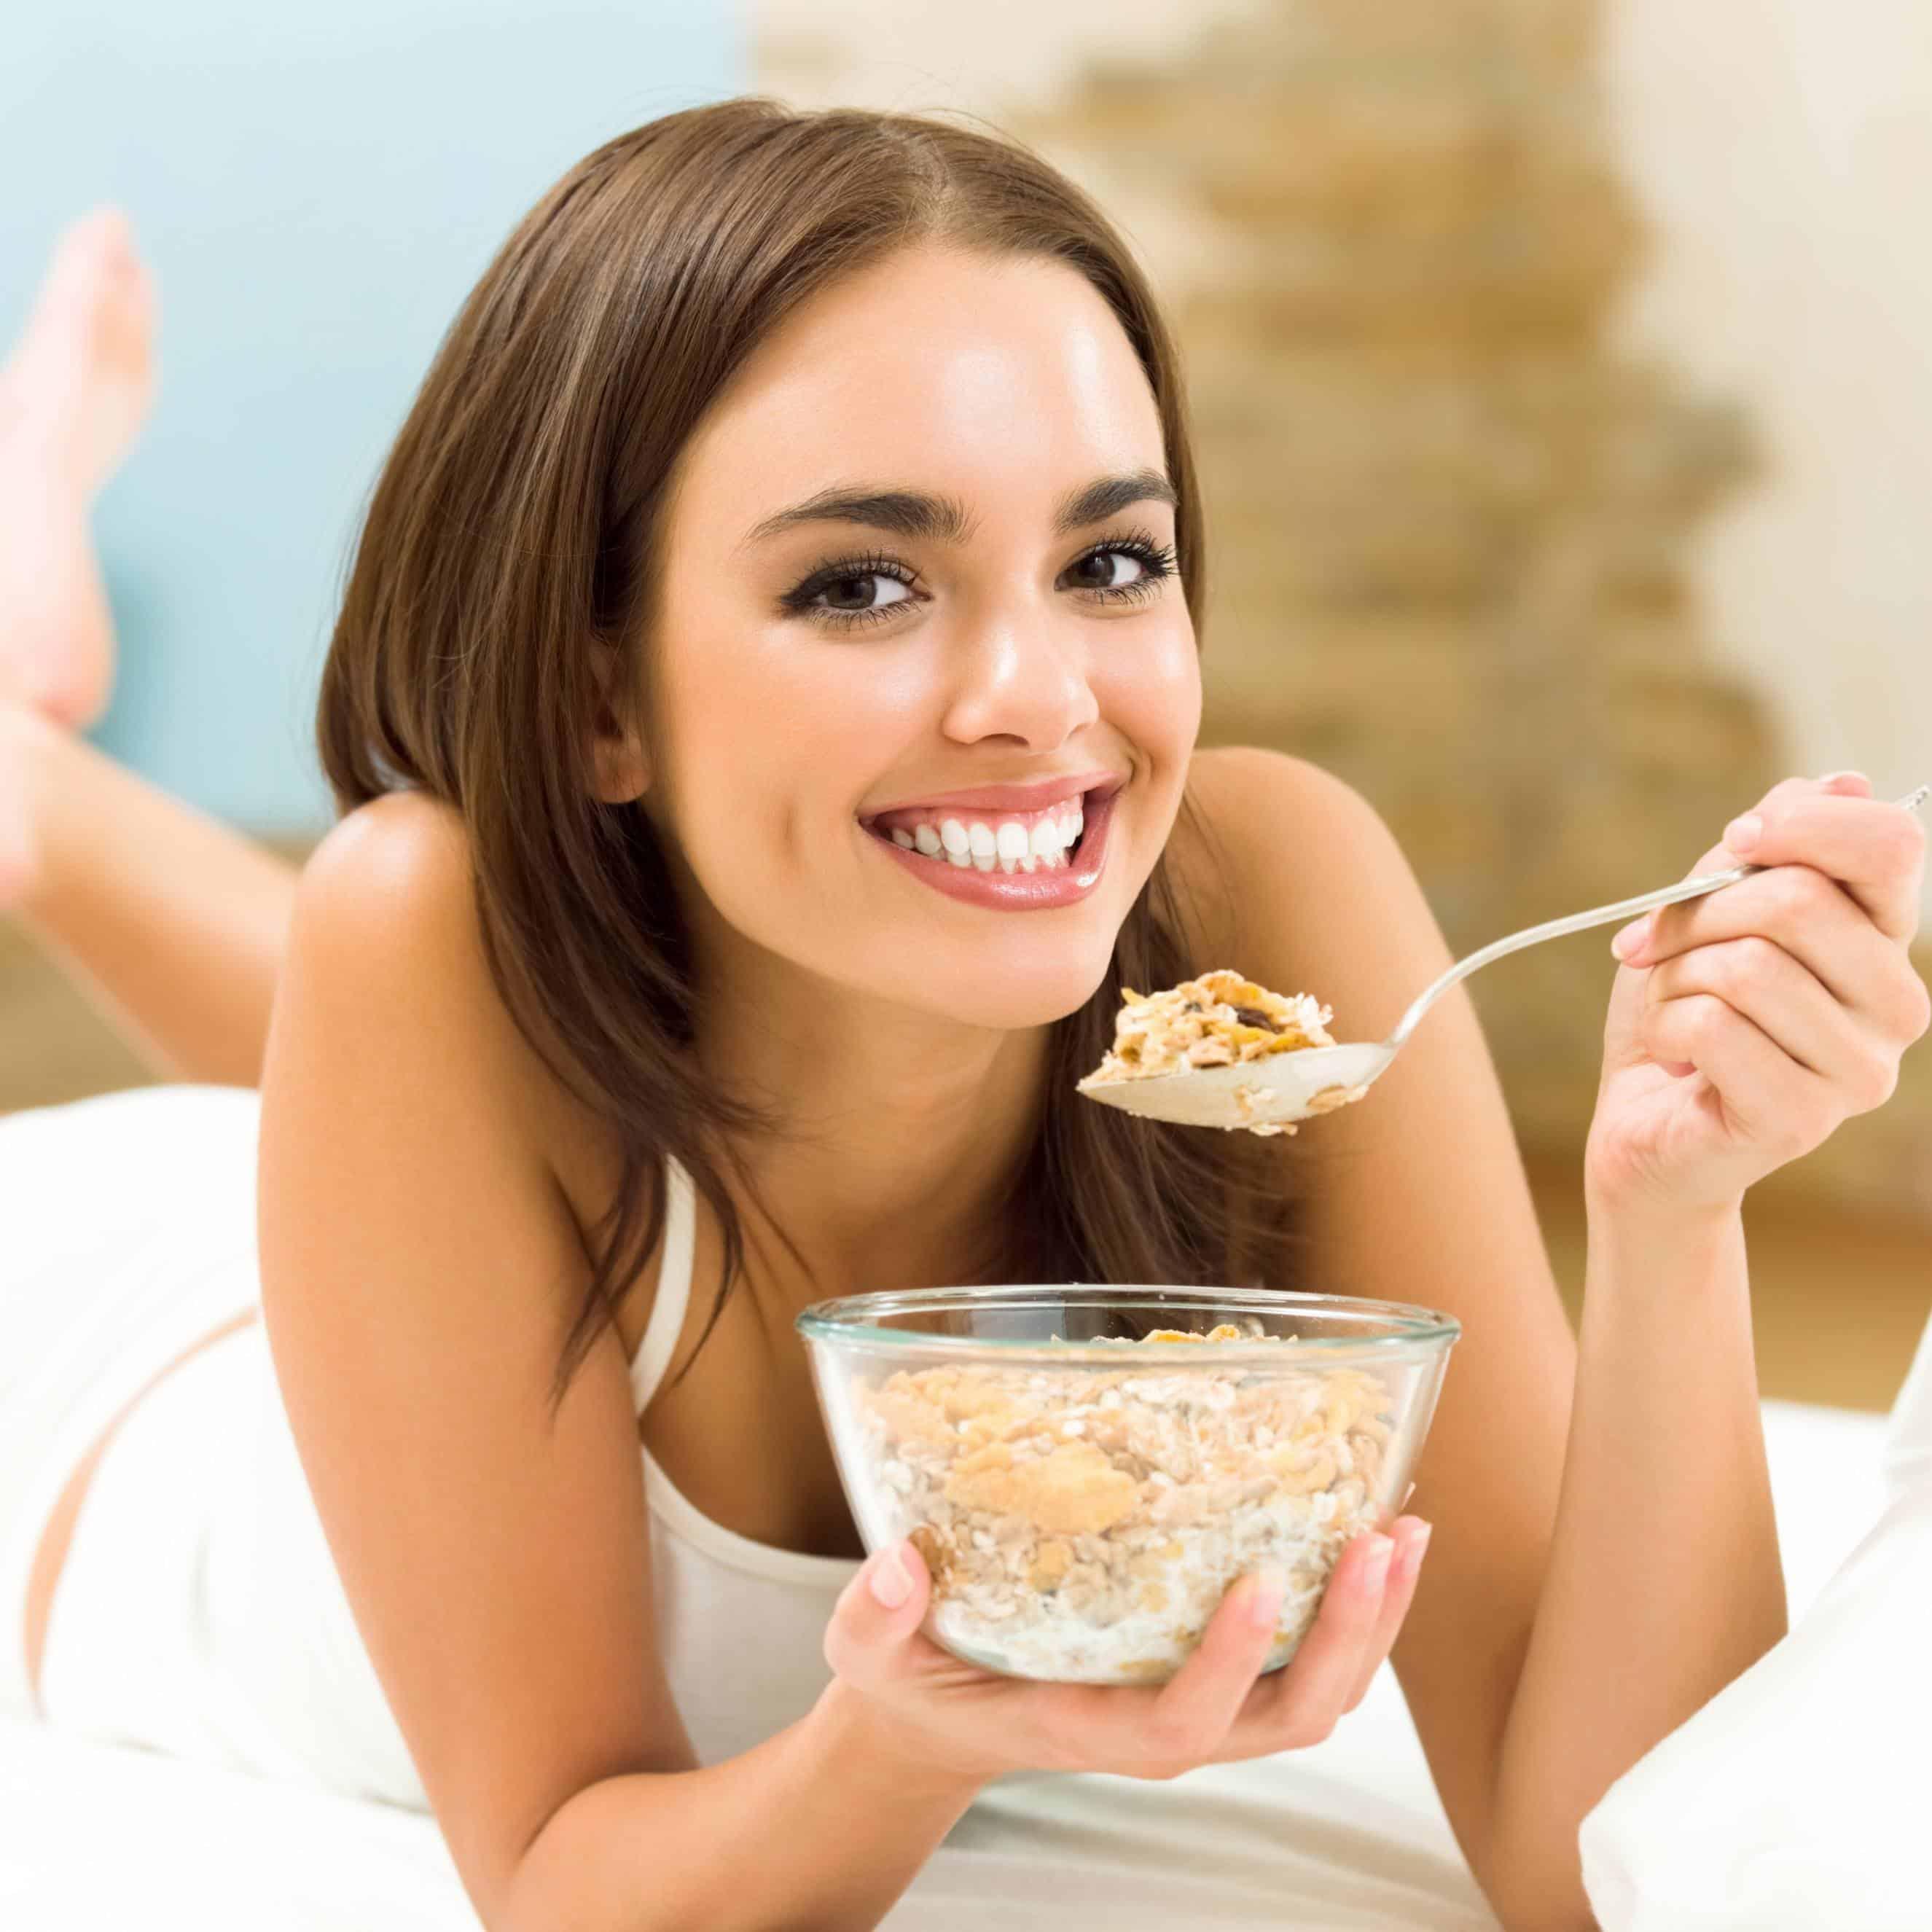 Oatmeal nutrition